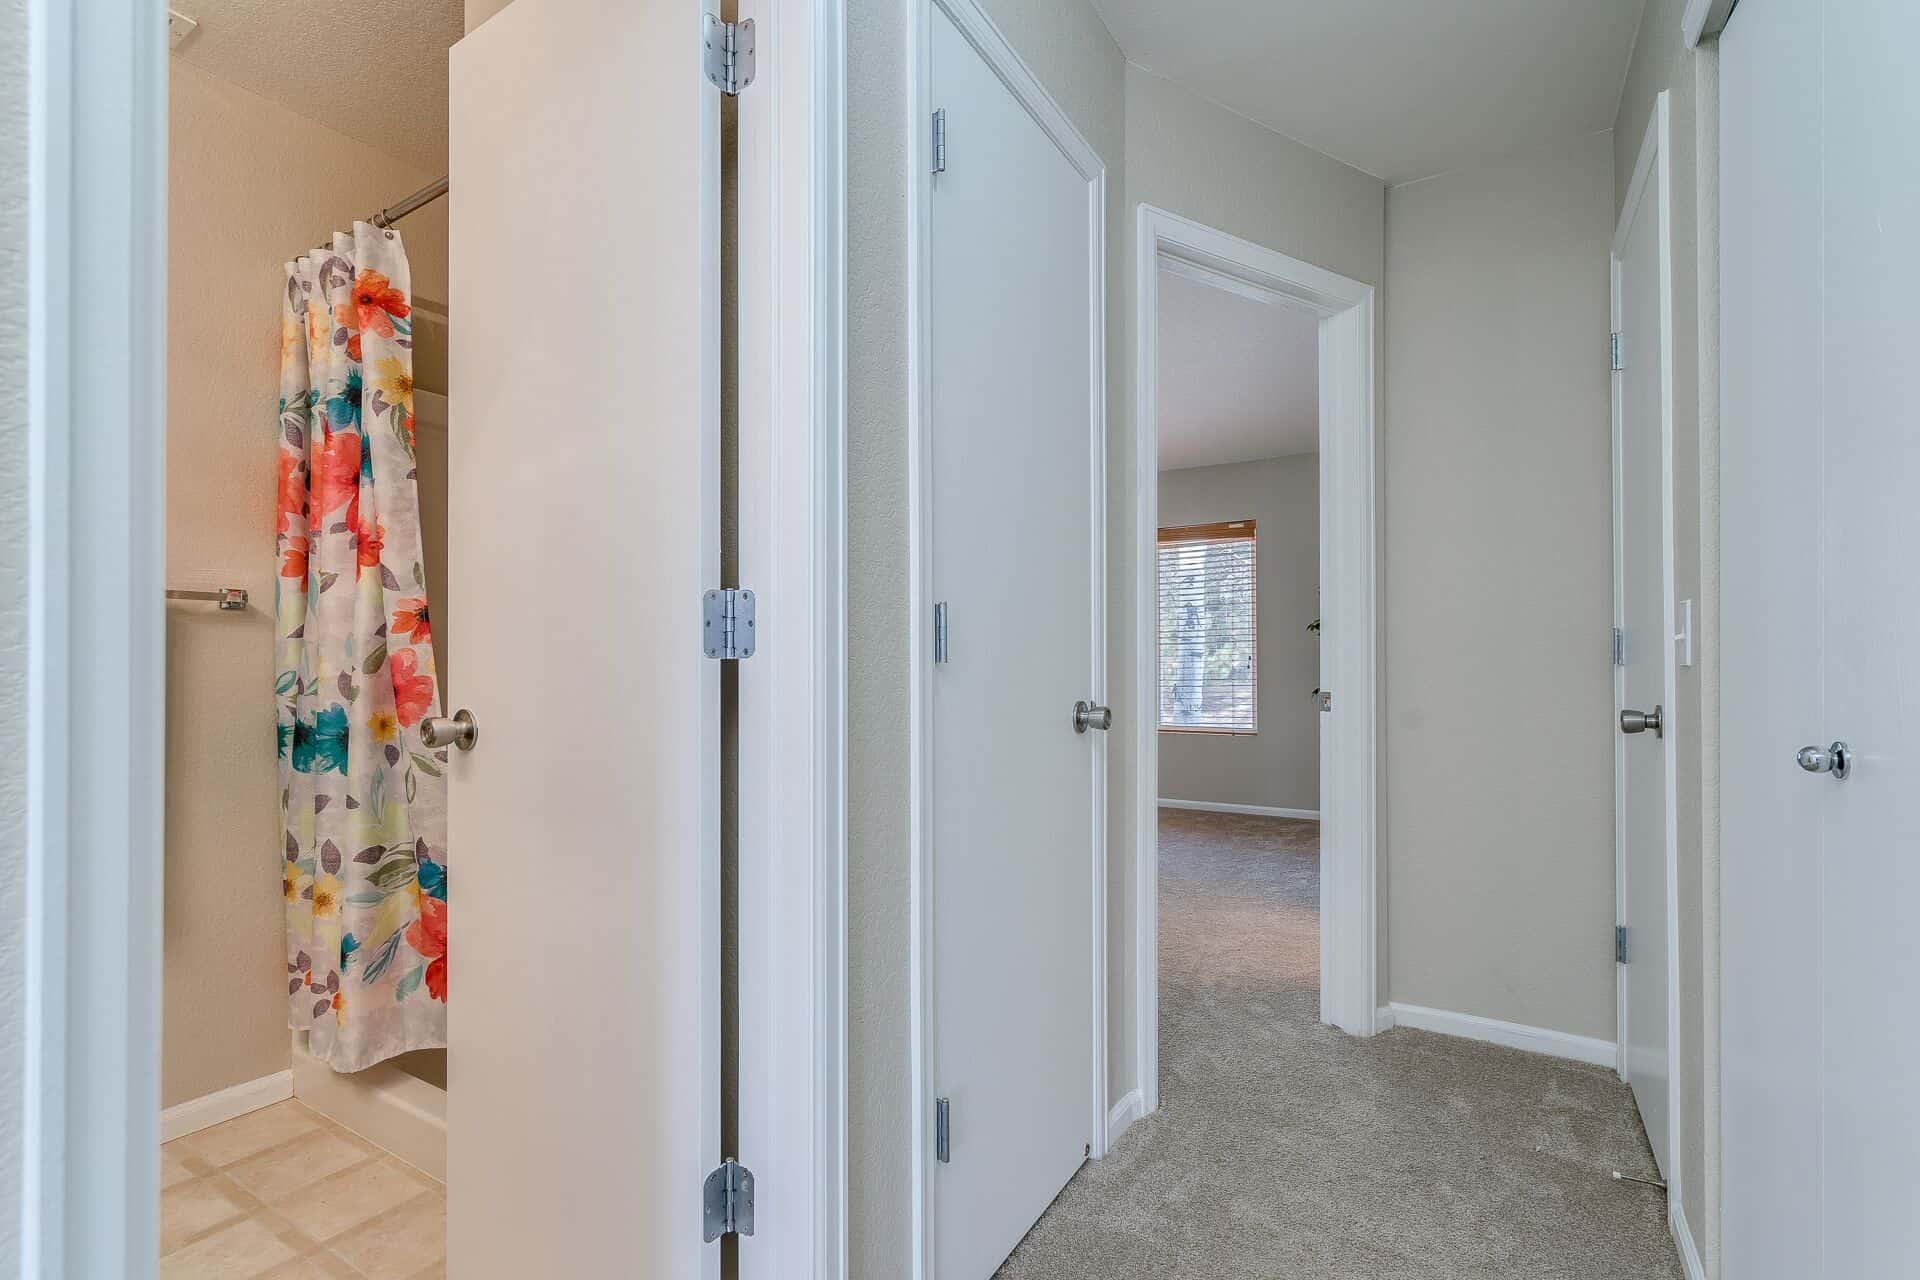 Hallway into Master Bedroom